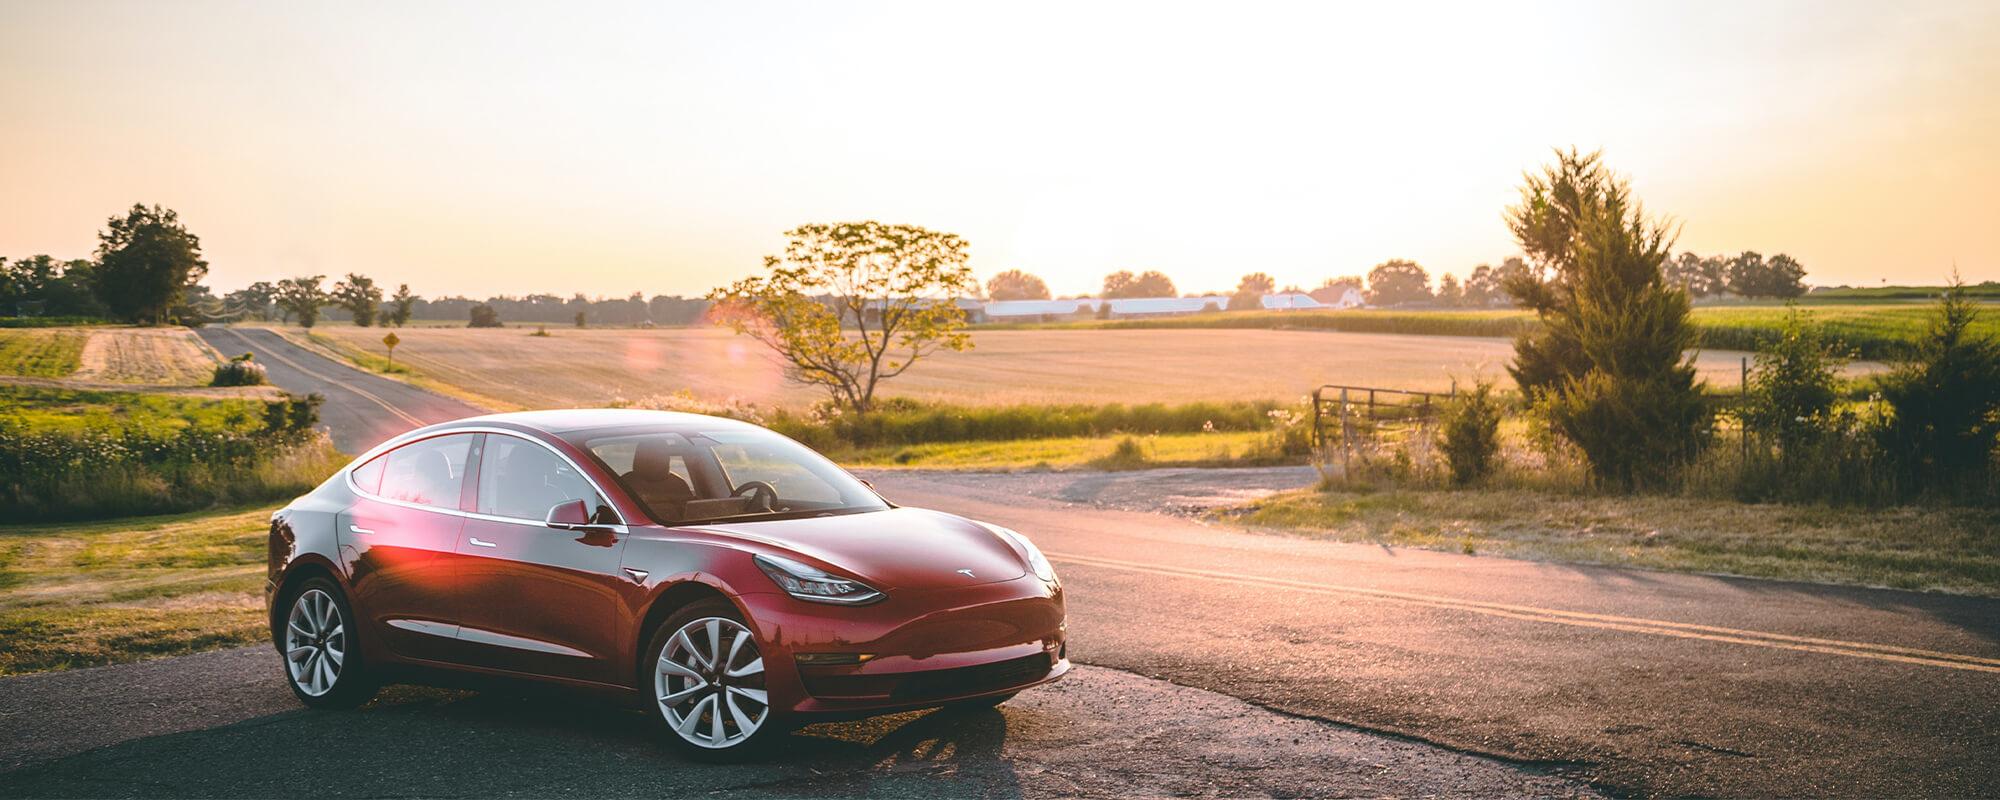 Tesla Model 3 Sunset